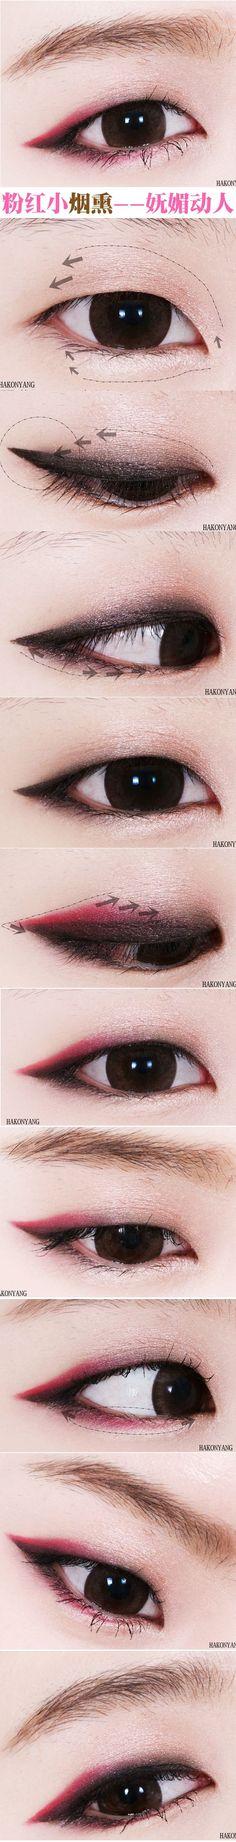 Pink smokey eye makeup | 粉红小烟熏